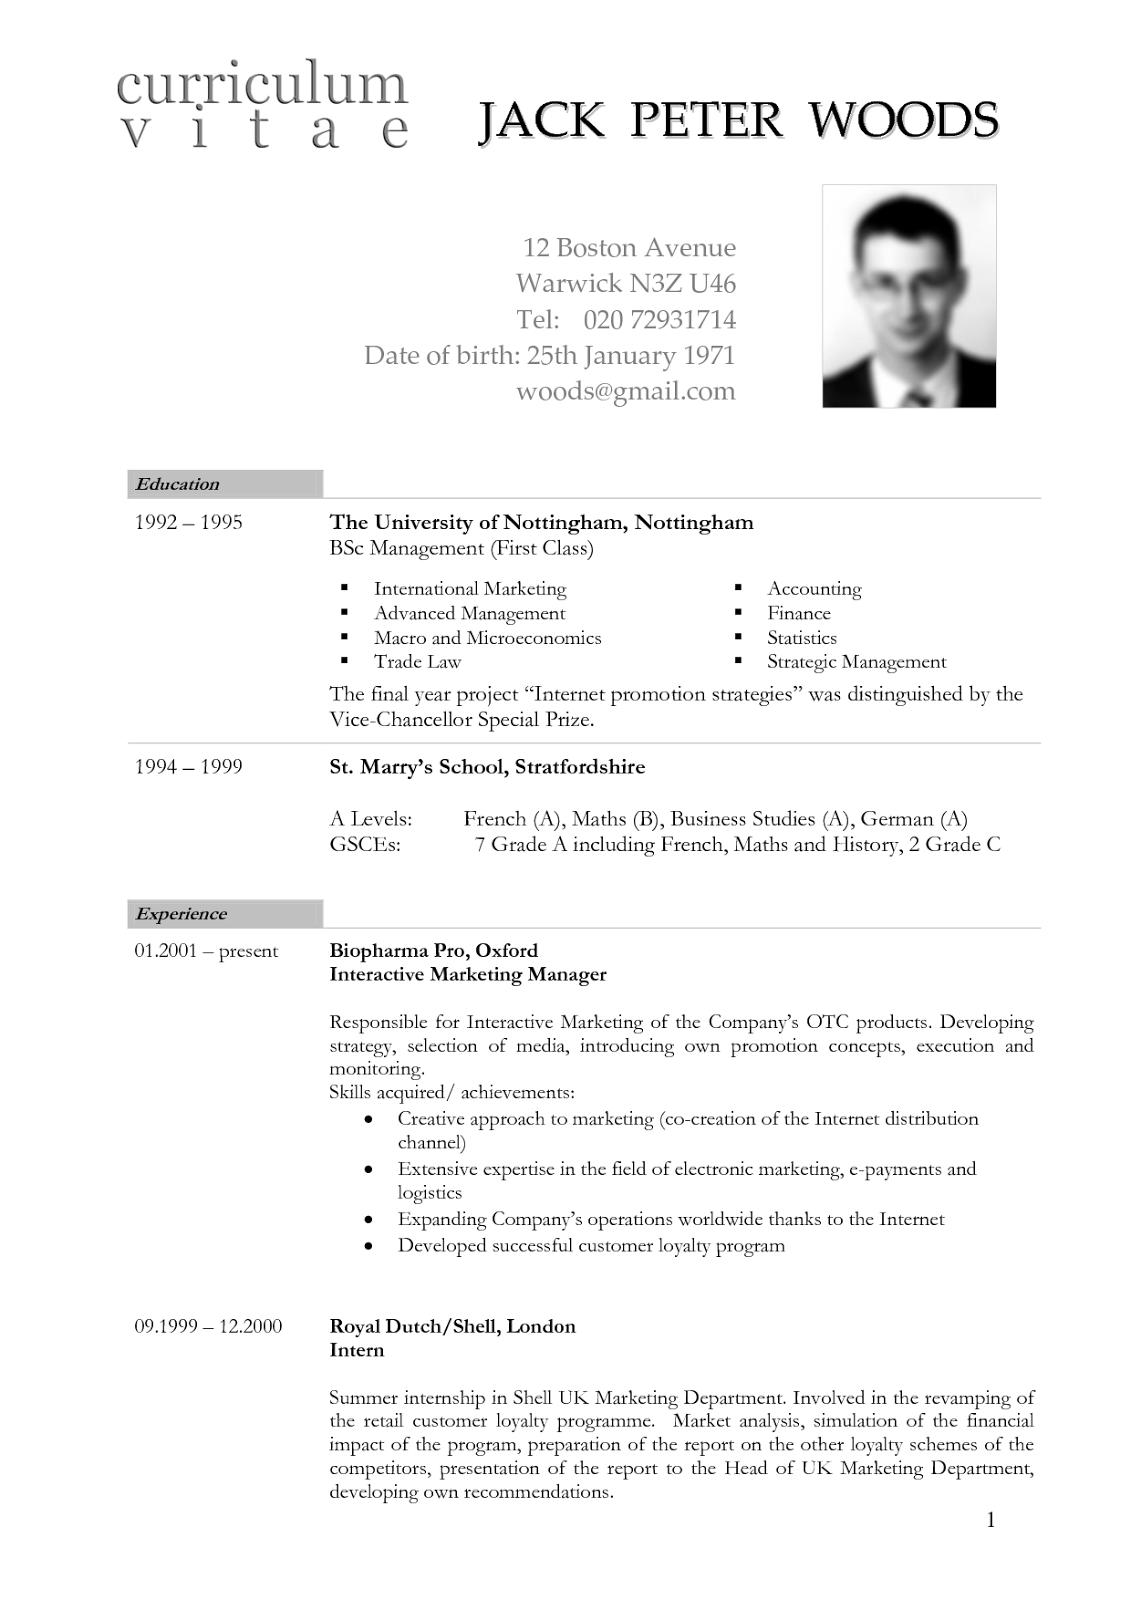 American Resume Samples Sample Resumes